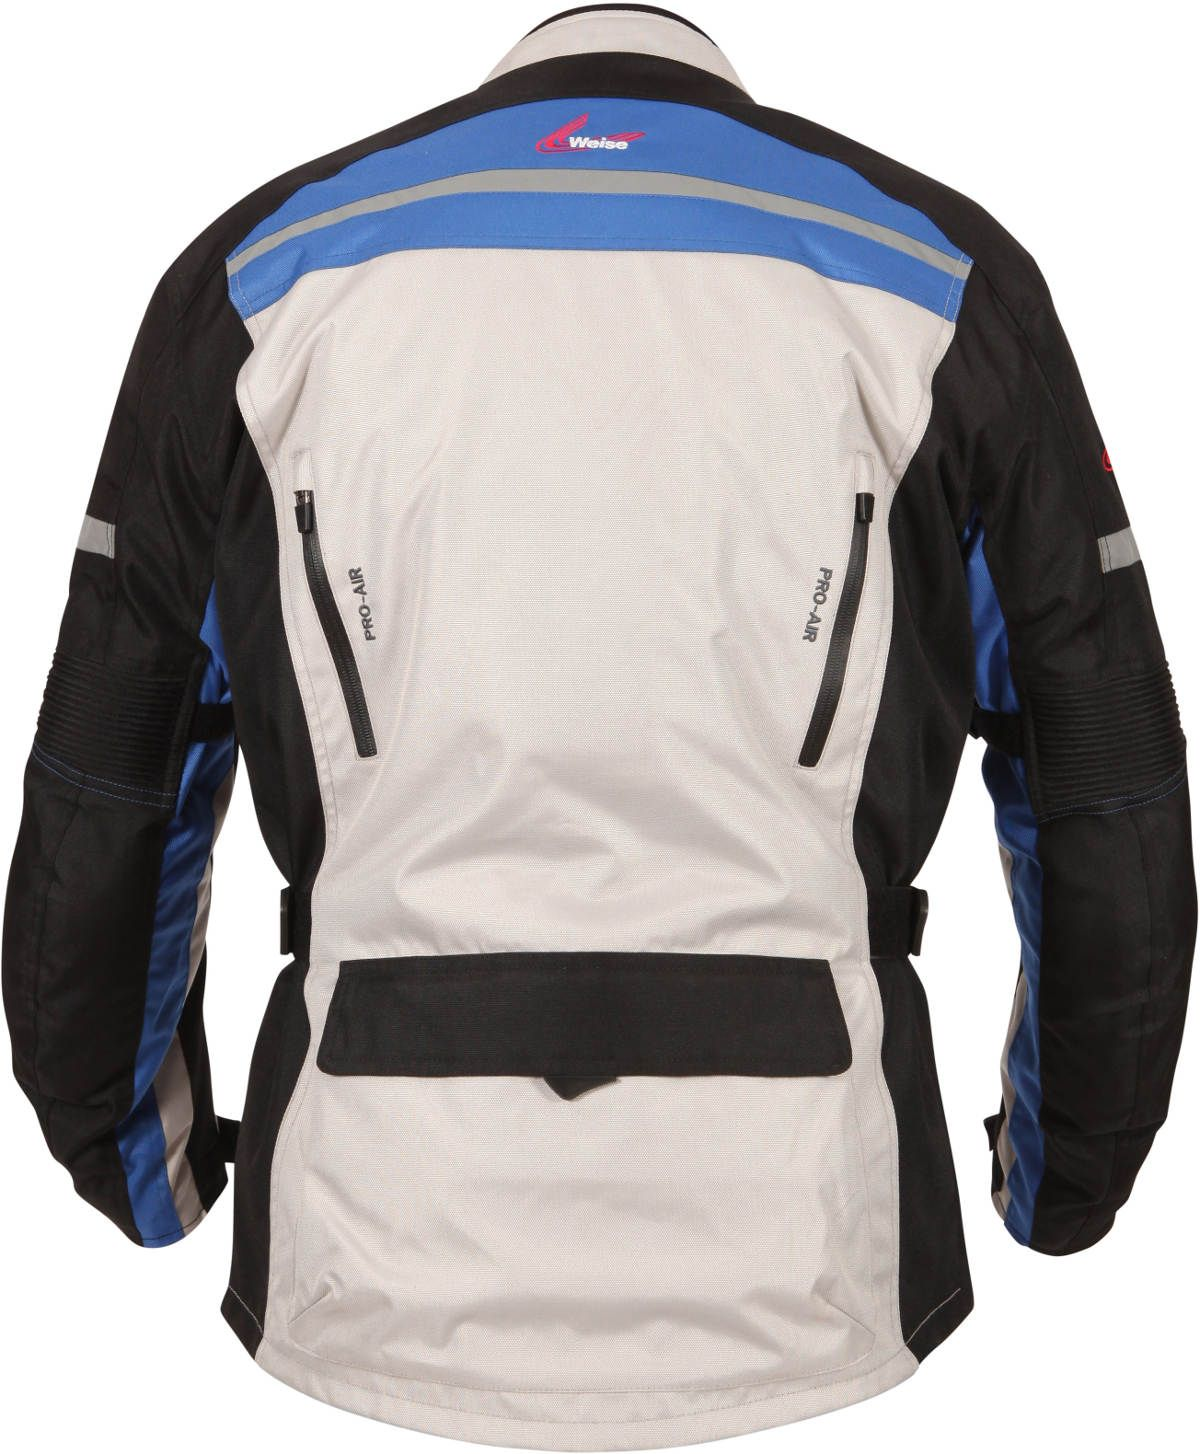 New Weise Stuttgart Textile Bike Jacket for 2018 Jackets